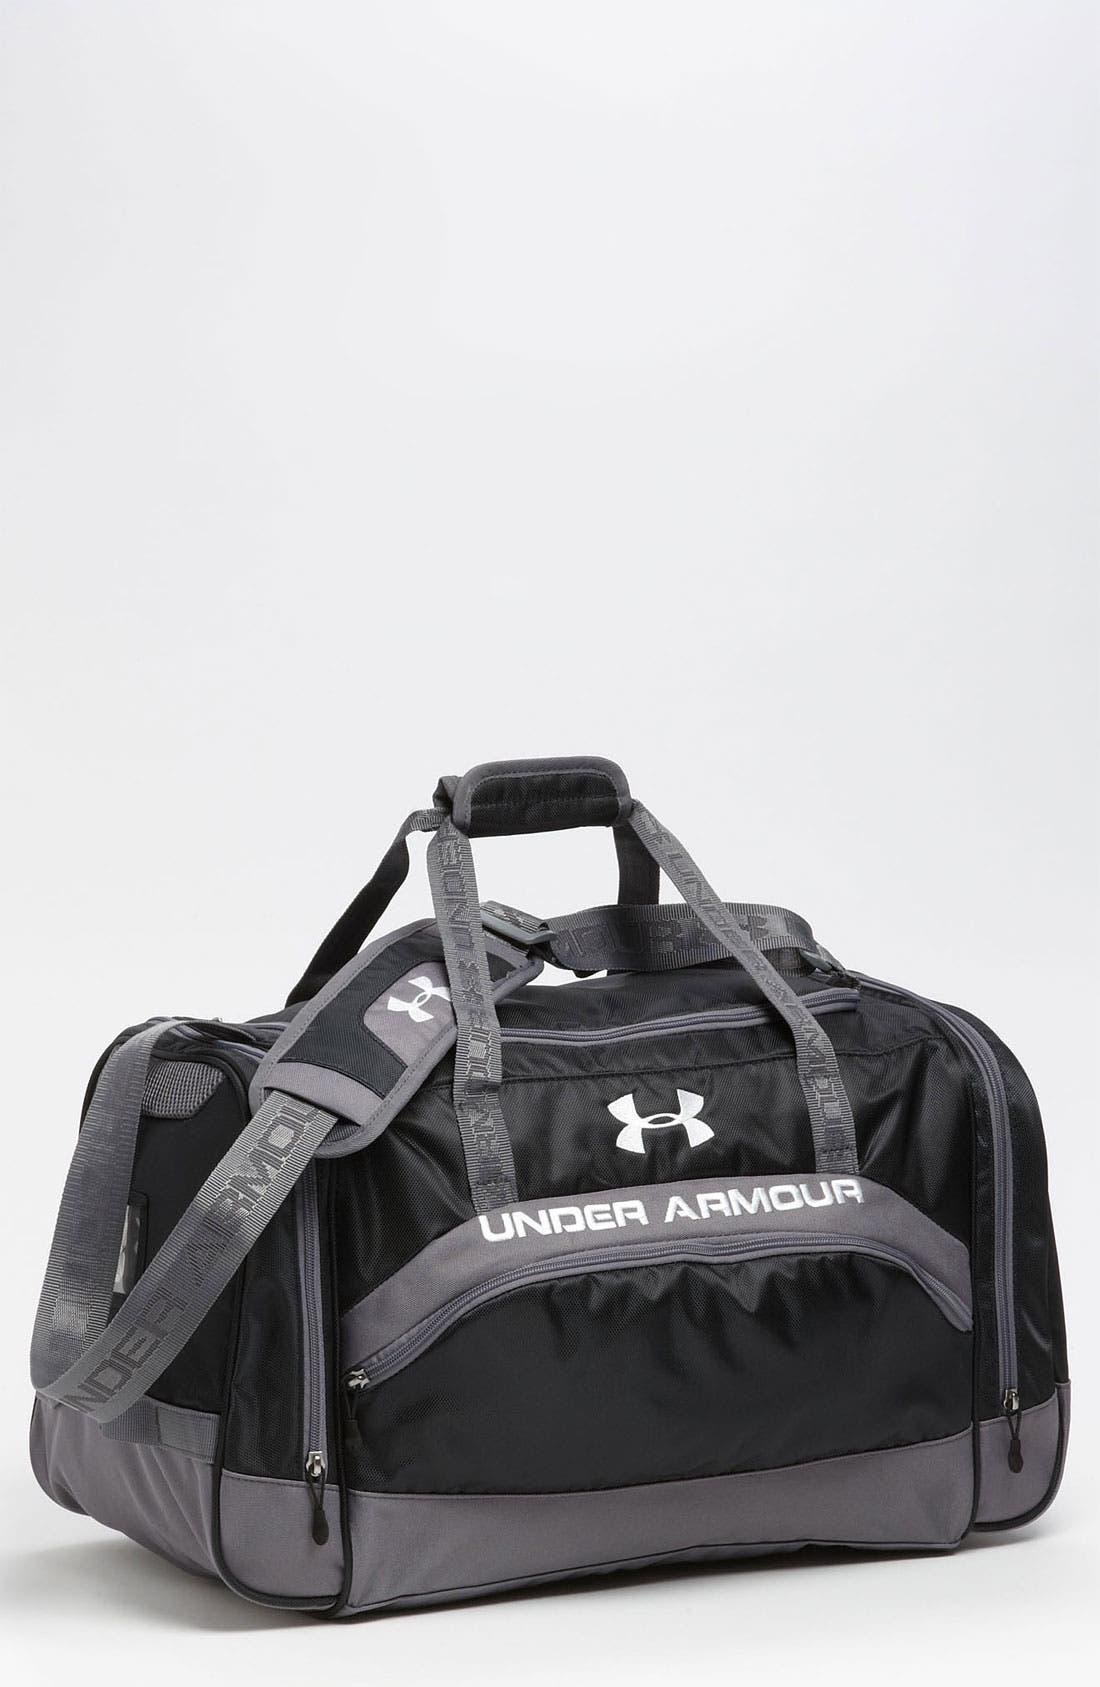 Main Image - Under Armour 'Victory Stream' Duffel Bag (Kids)